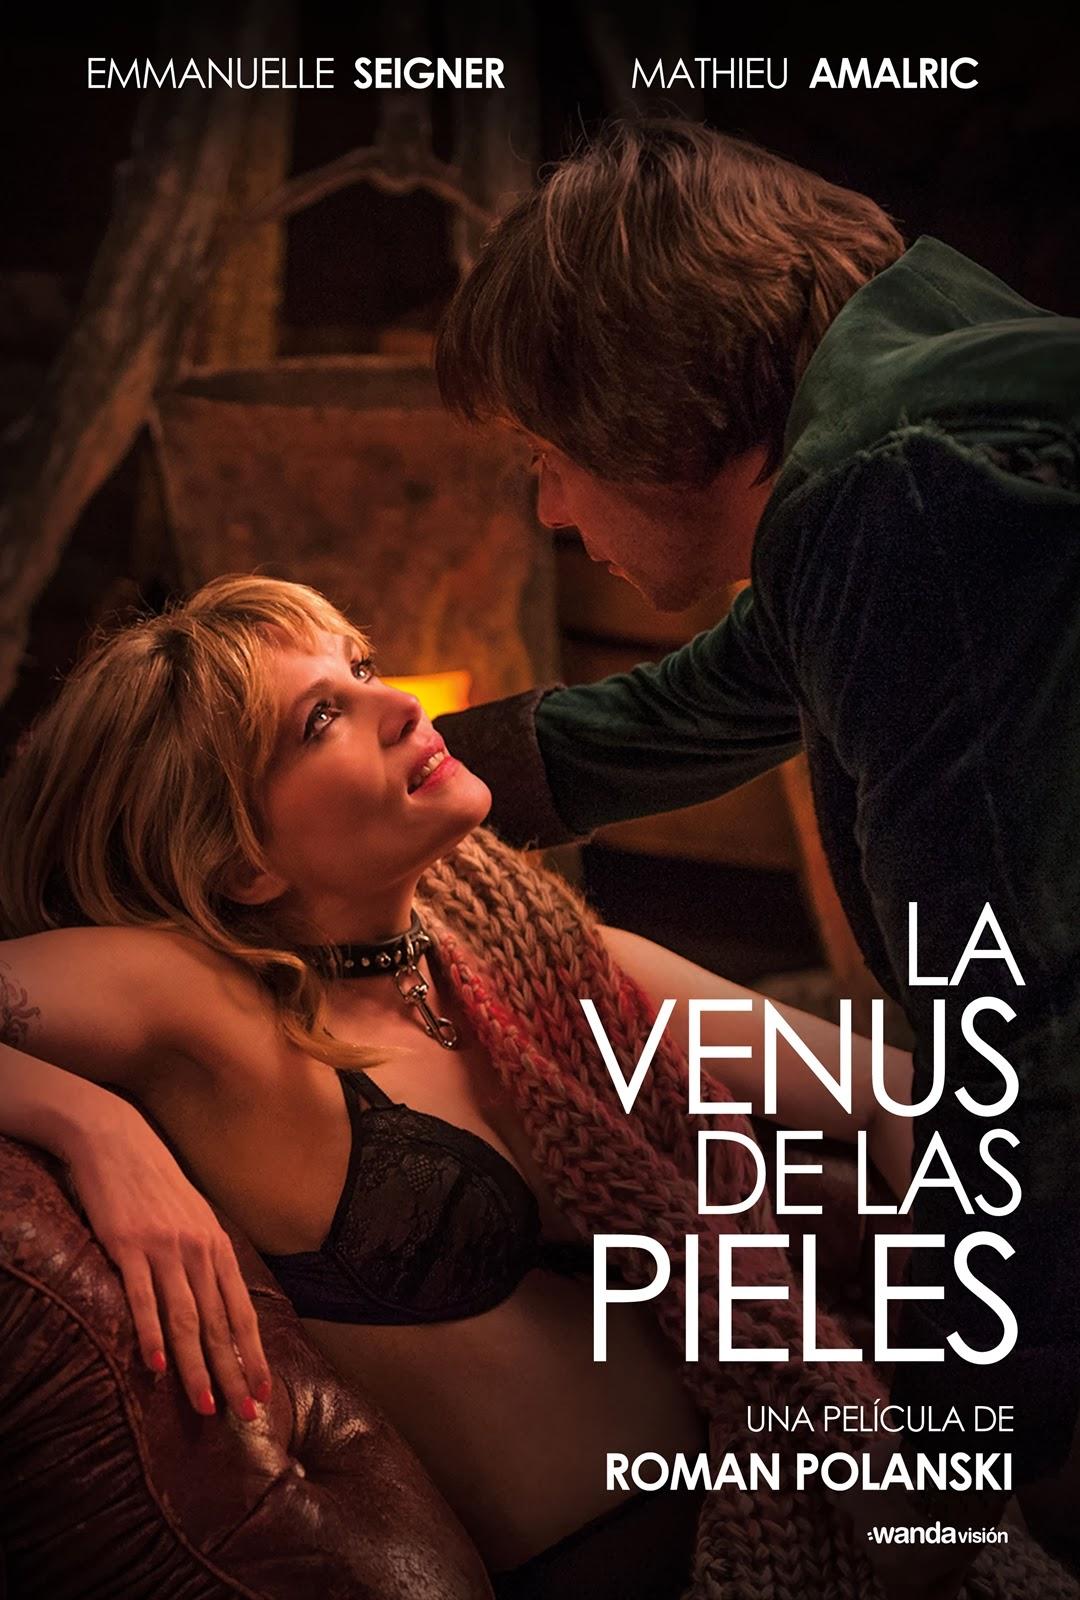 http://4.bp.blogspot.com/-TSCx0BS5PVQ/Uw3Yc8hCf1I/AAAAAAAAIOE/ShHyuebWGqY/s1600/la_venus_de_las_pieles.jpg